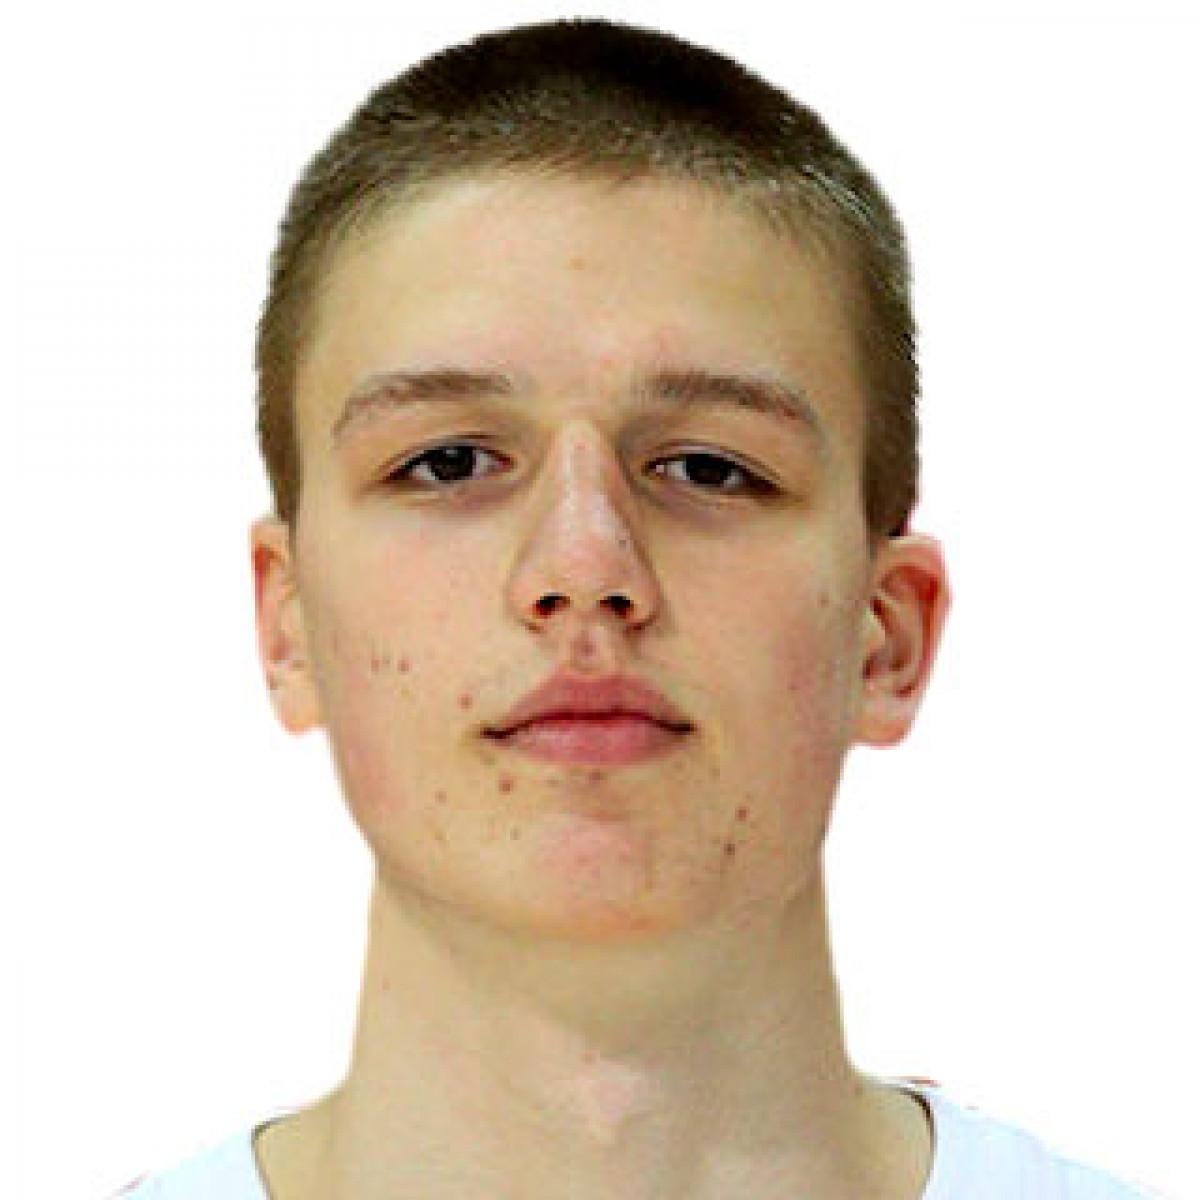 Marko Pavicevic